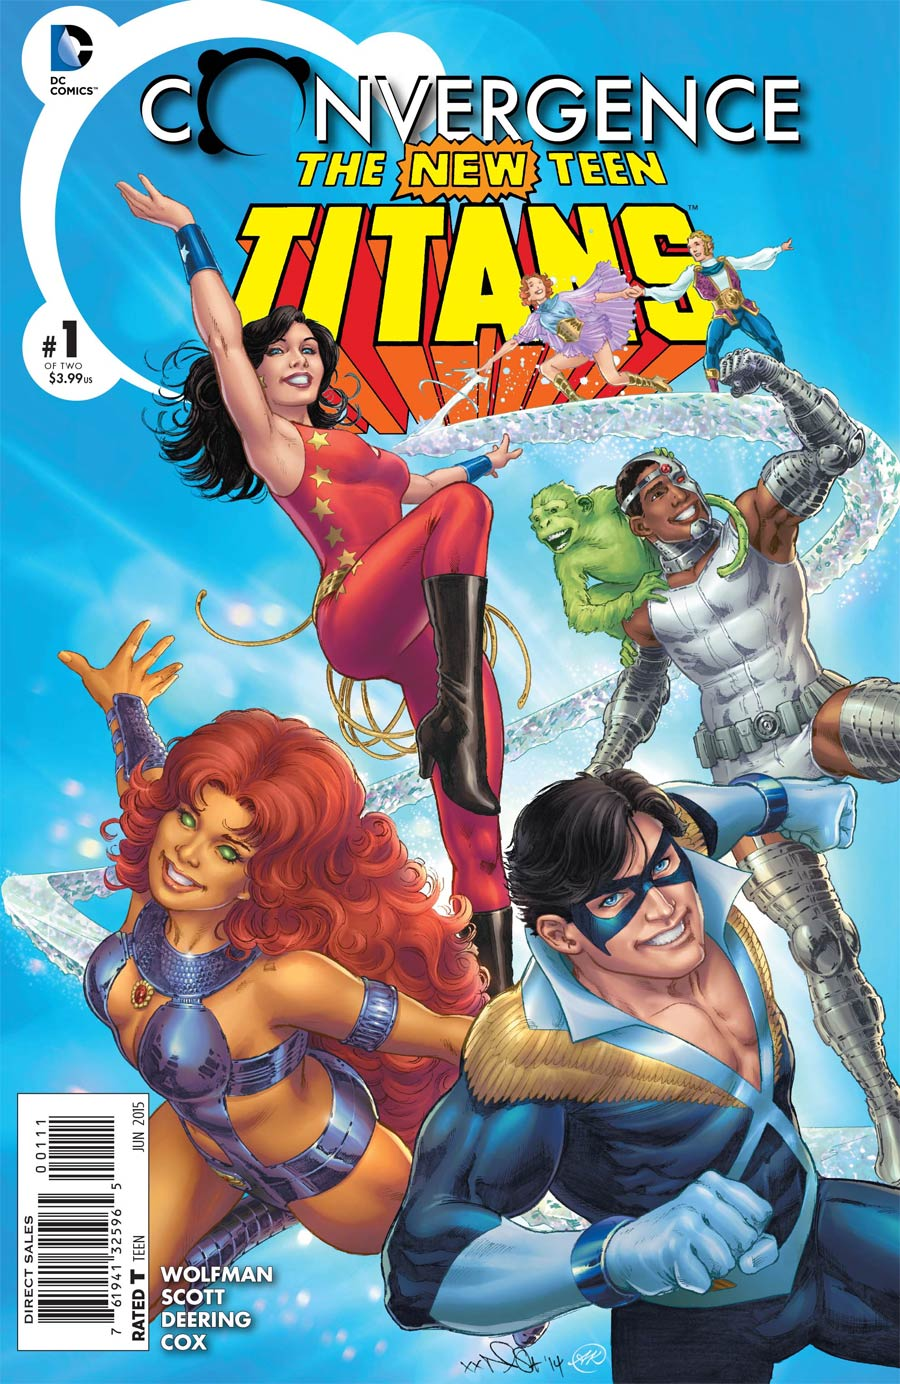 Convergence New Teen Titans #1 Cover A Regular Nicola Scott Cover